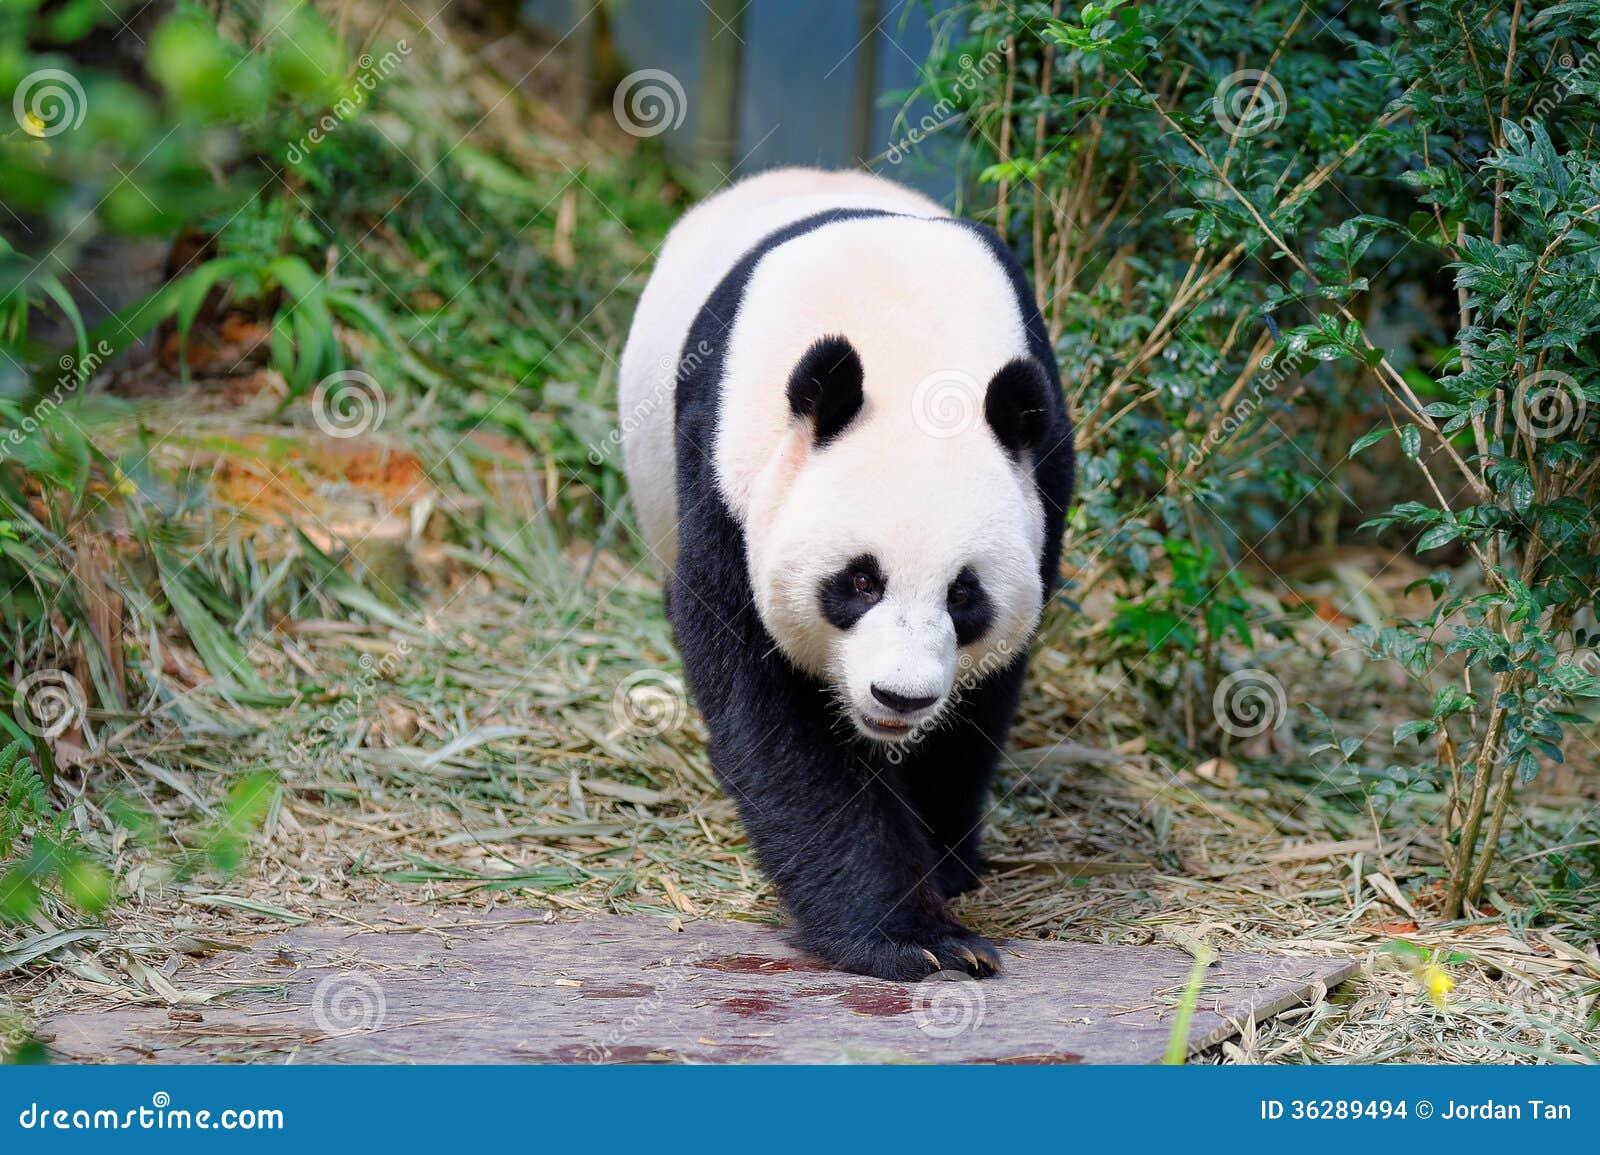 Jia Jia the female panda walking in its enclosure